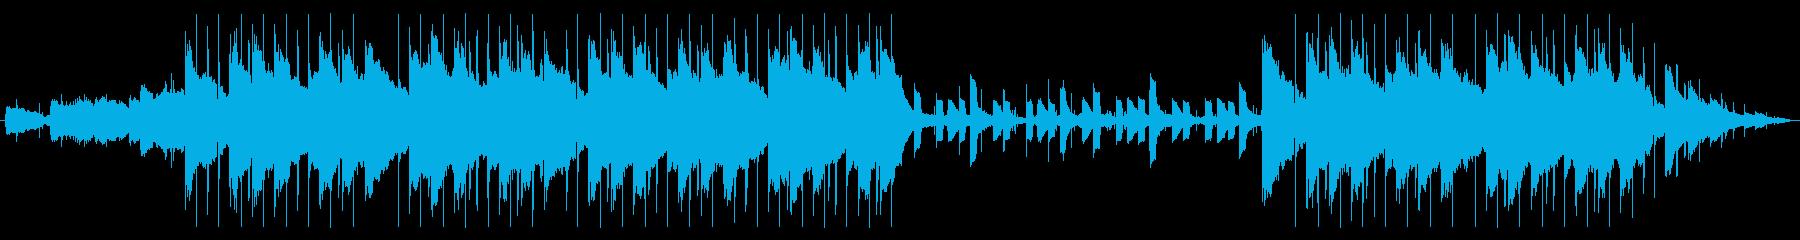 Lofi Hiphop/お洒落系VLOGの再生済みの波形